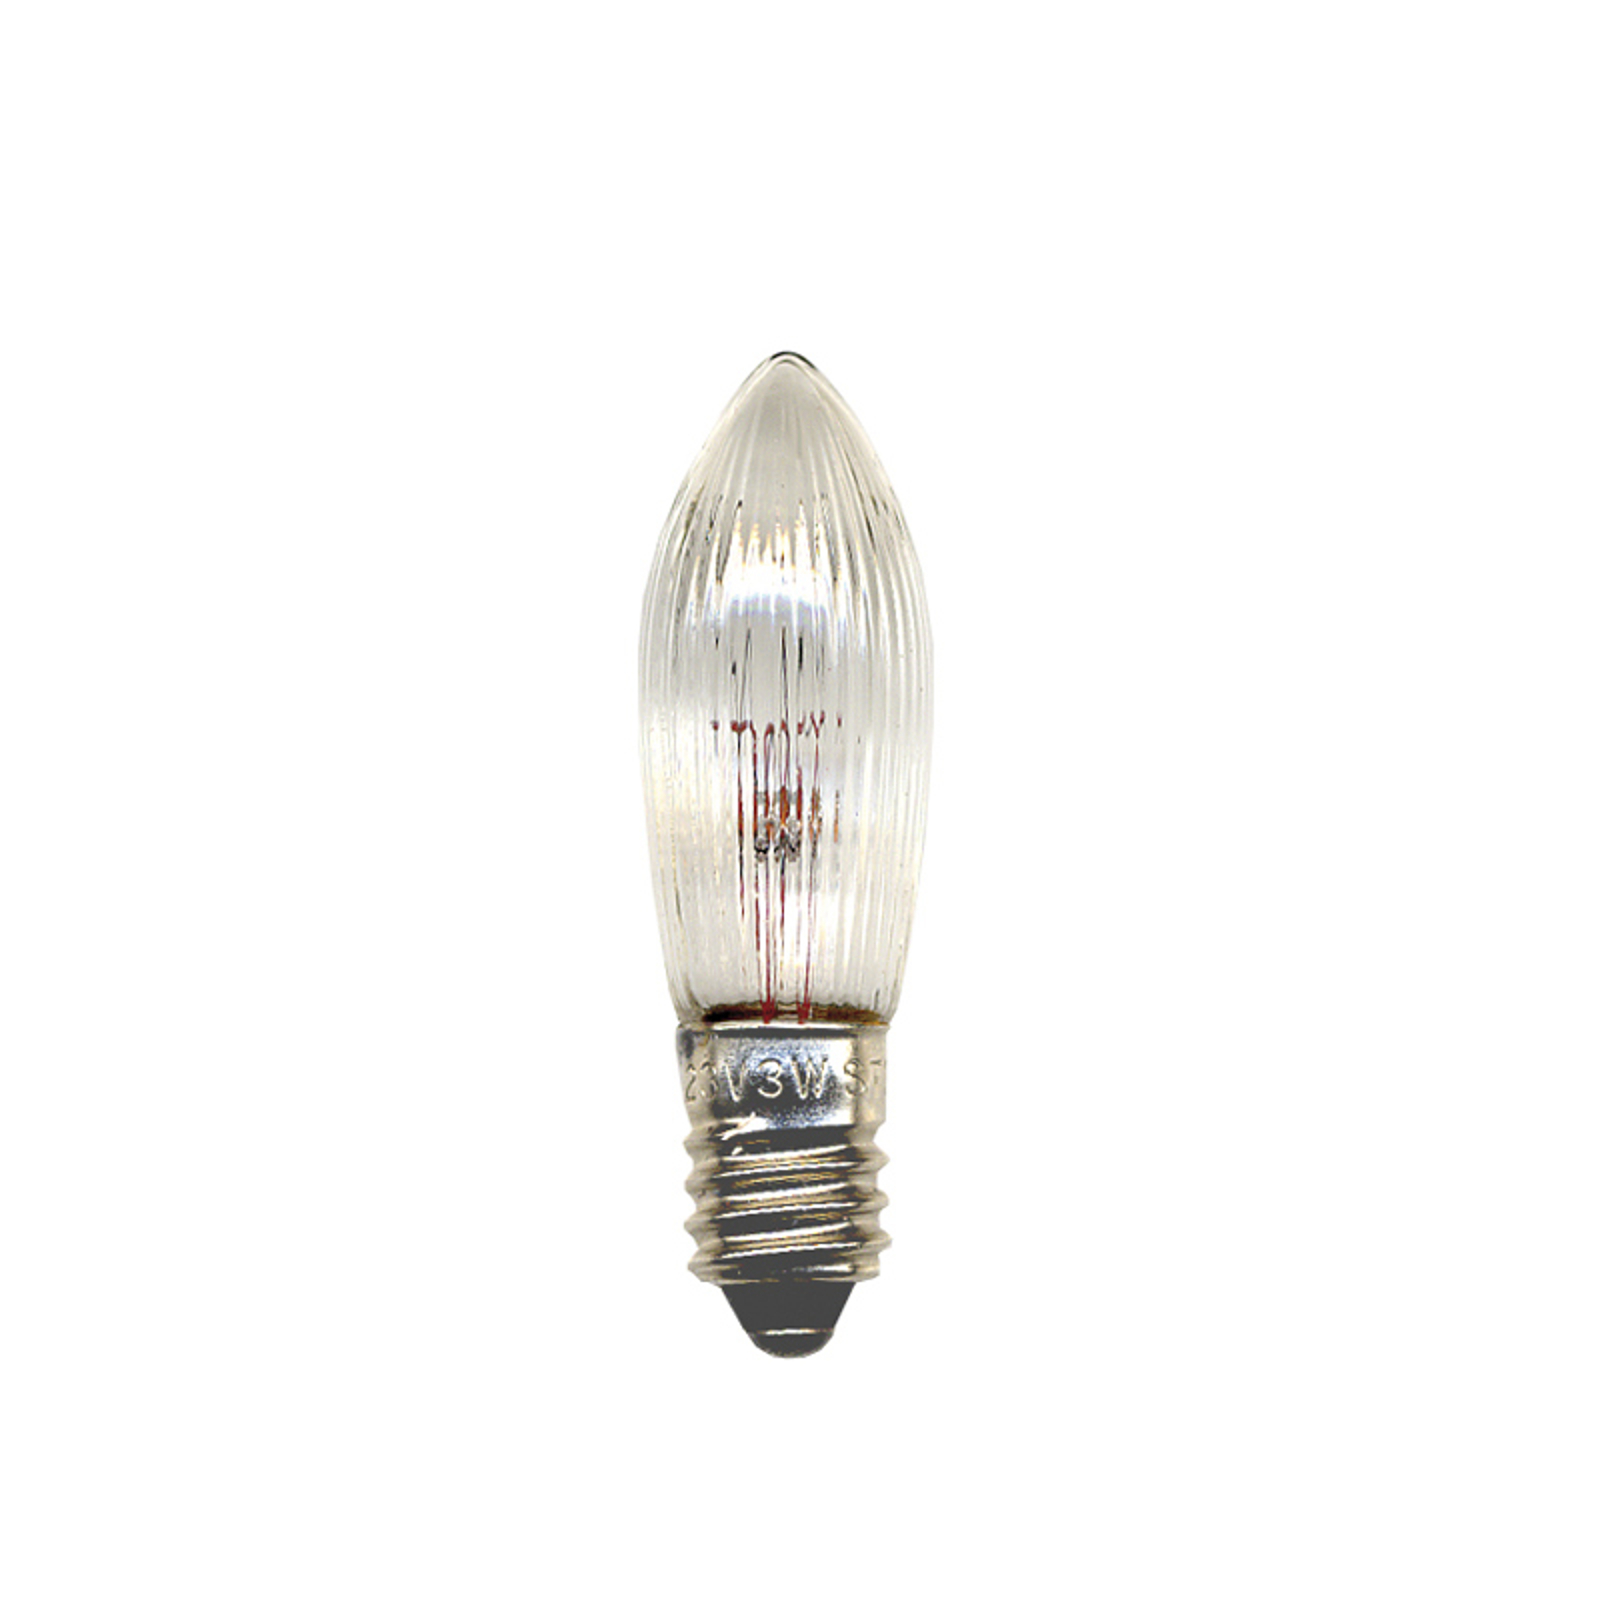 E10 2.4W 12V bulb,  pack of 3, candle shape_1522322_1